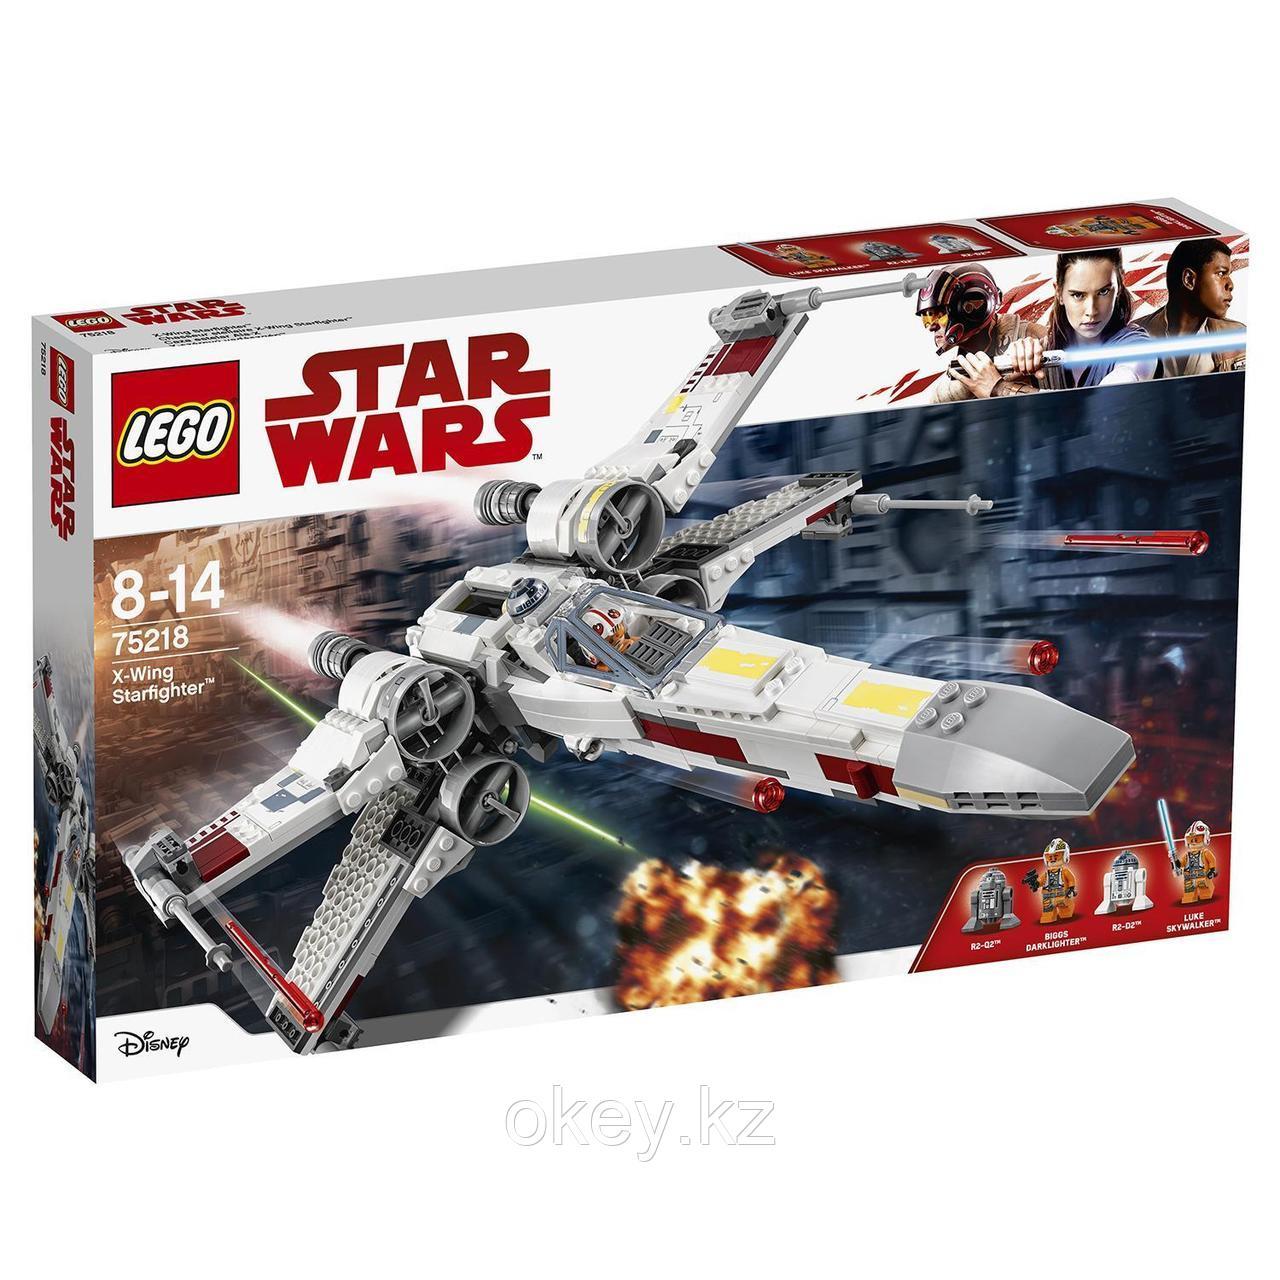 LEGO Star Wars: Звёздный истребитель типа Х 75218